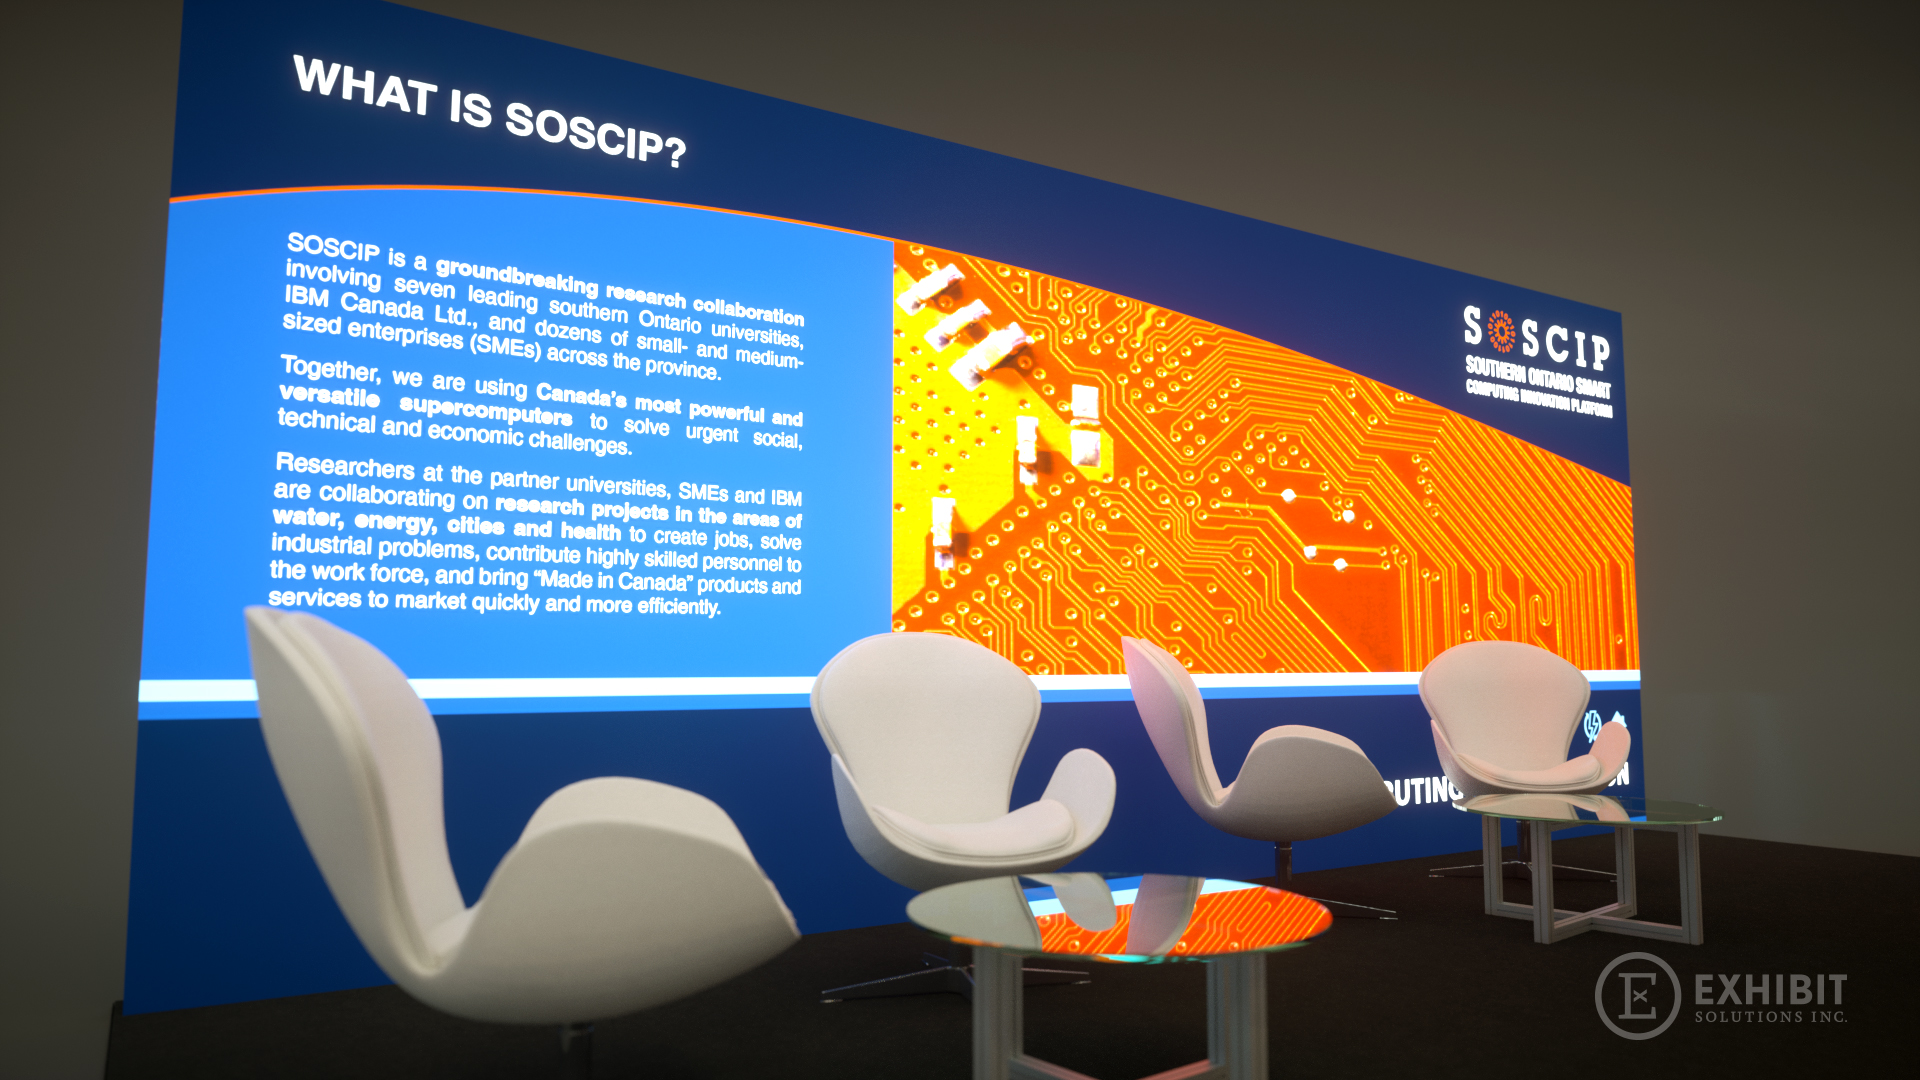 2906 - UofT - SOSCIP - OCE Discovery 2015 - View 3.jpg